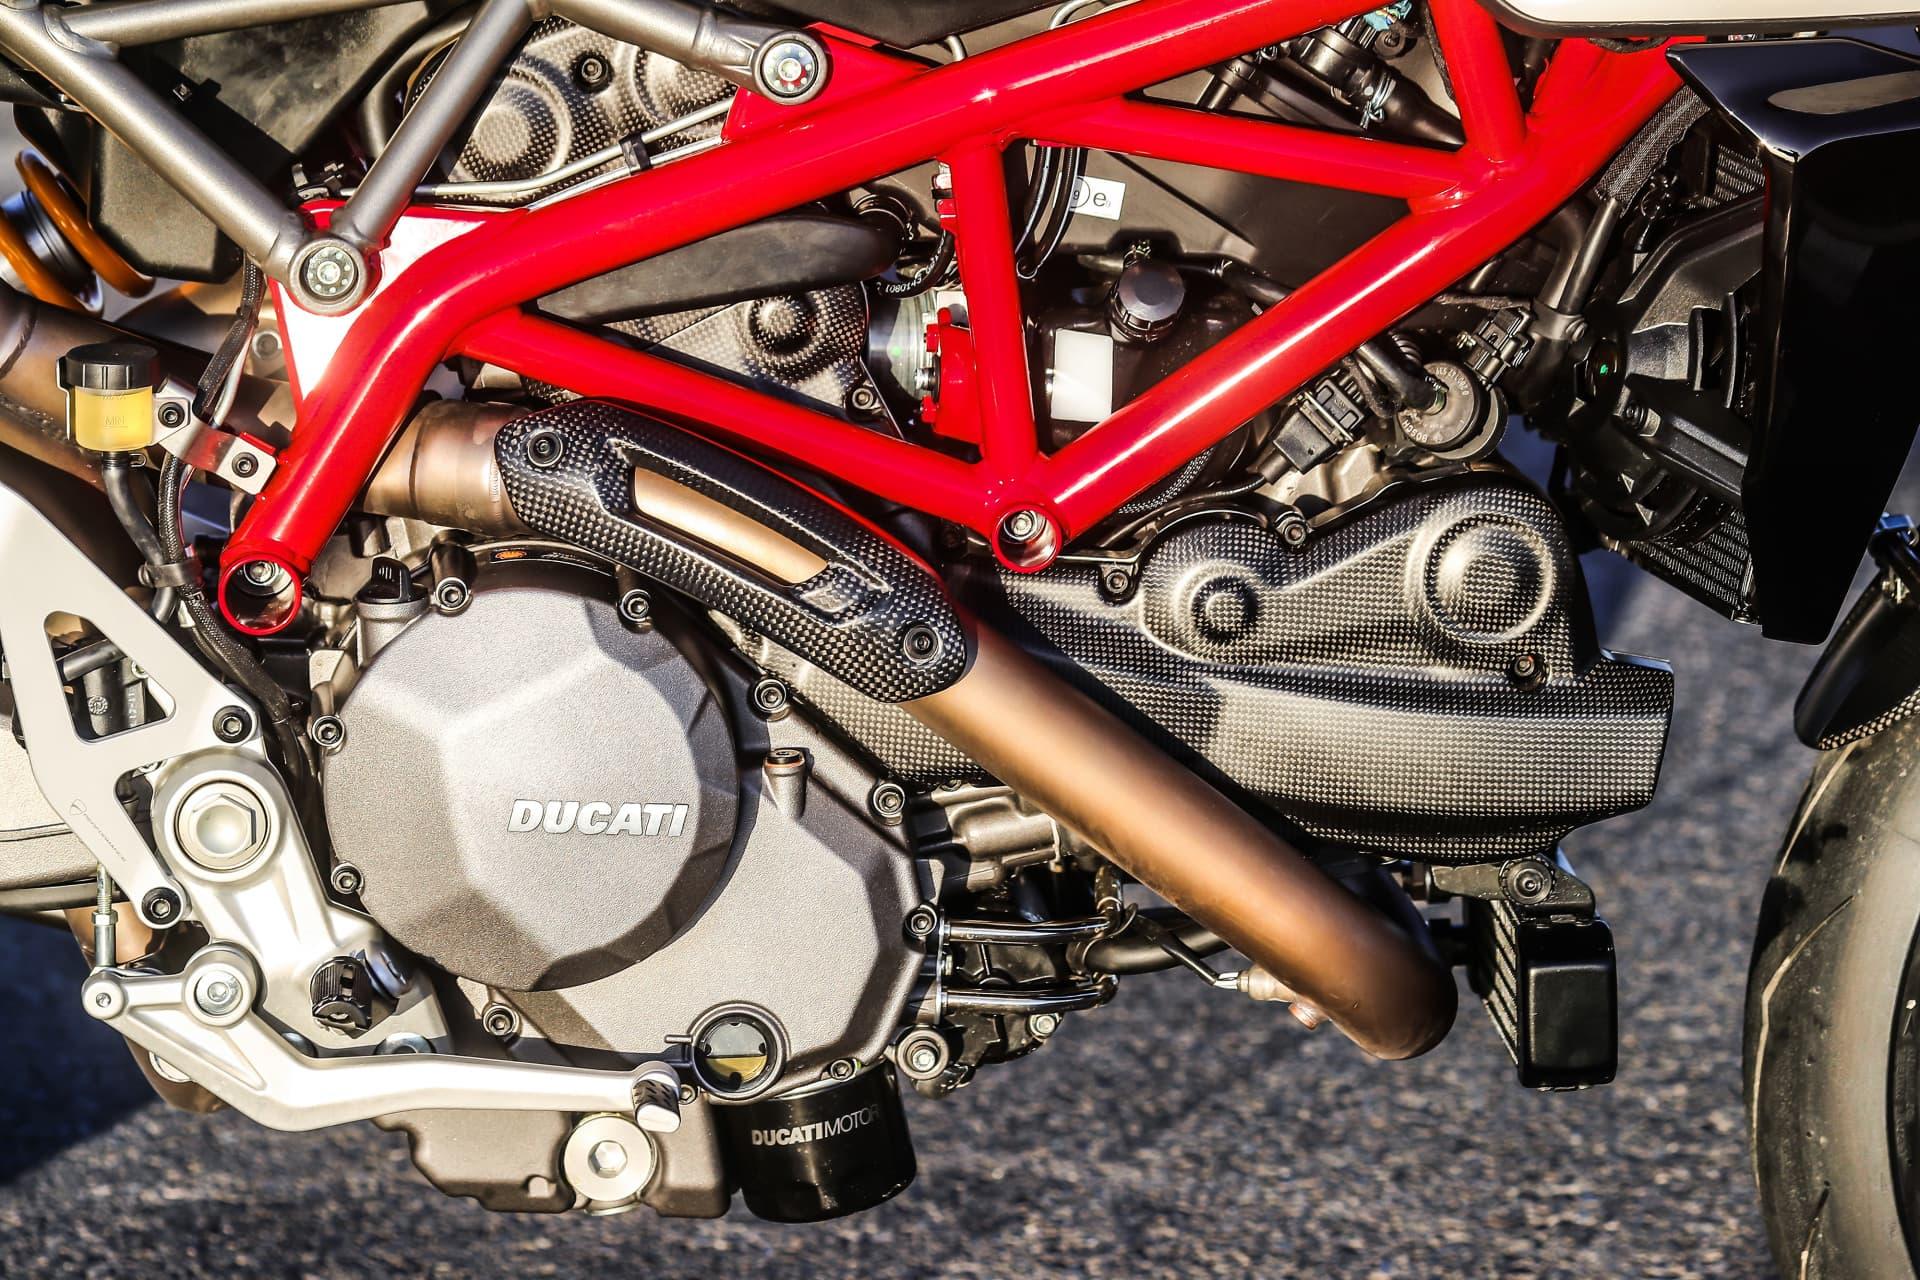 Ducati Hypermotard 950 Sp Static 36 Uc70298 Mid